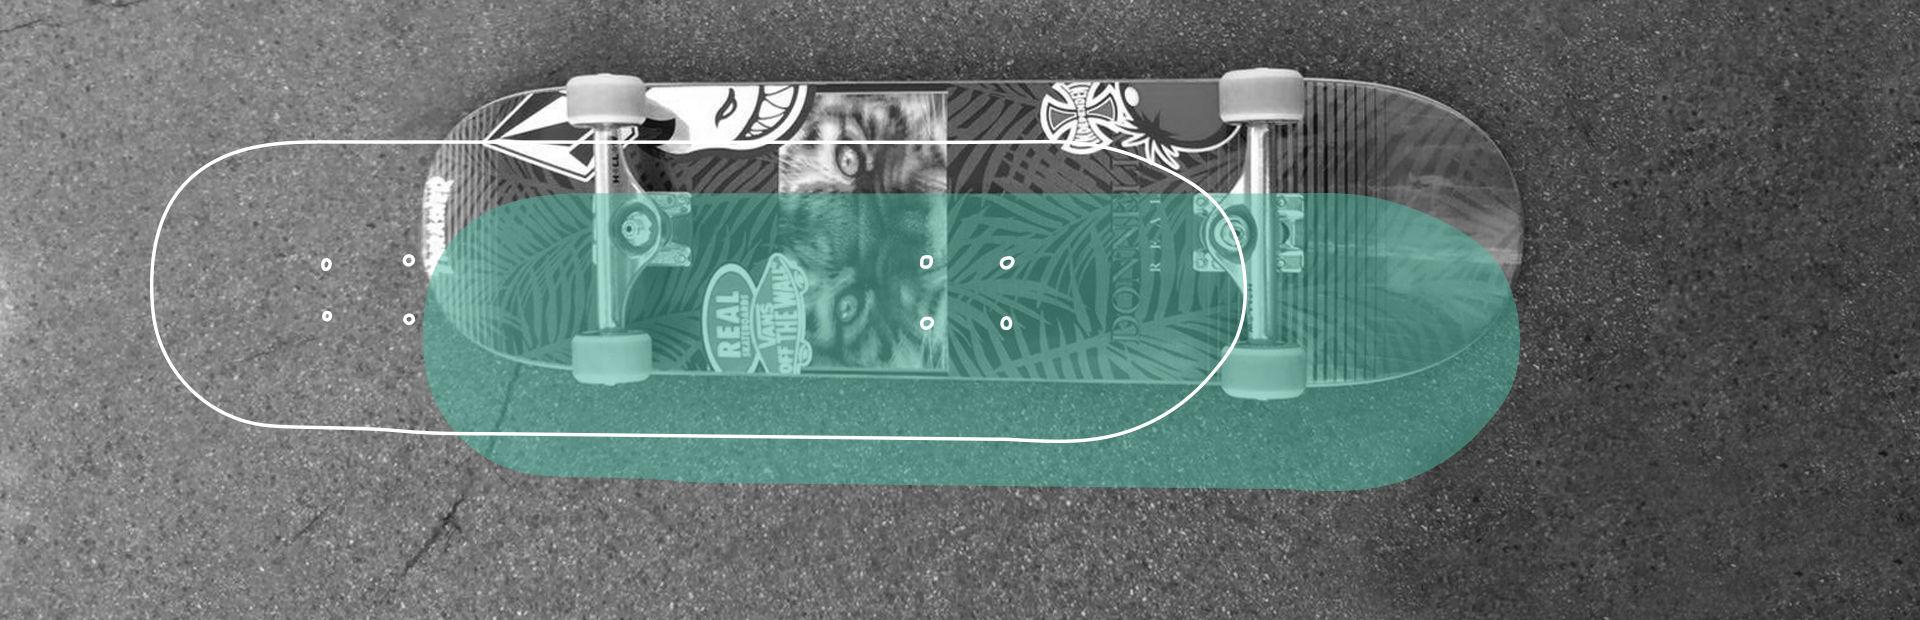 Skateboard-deck closeup